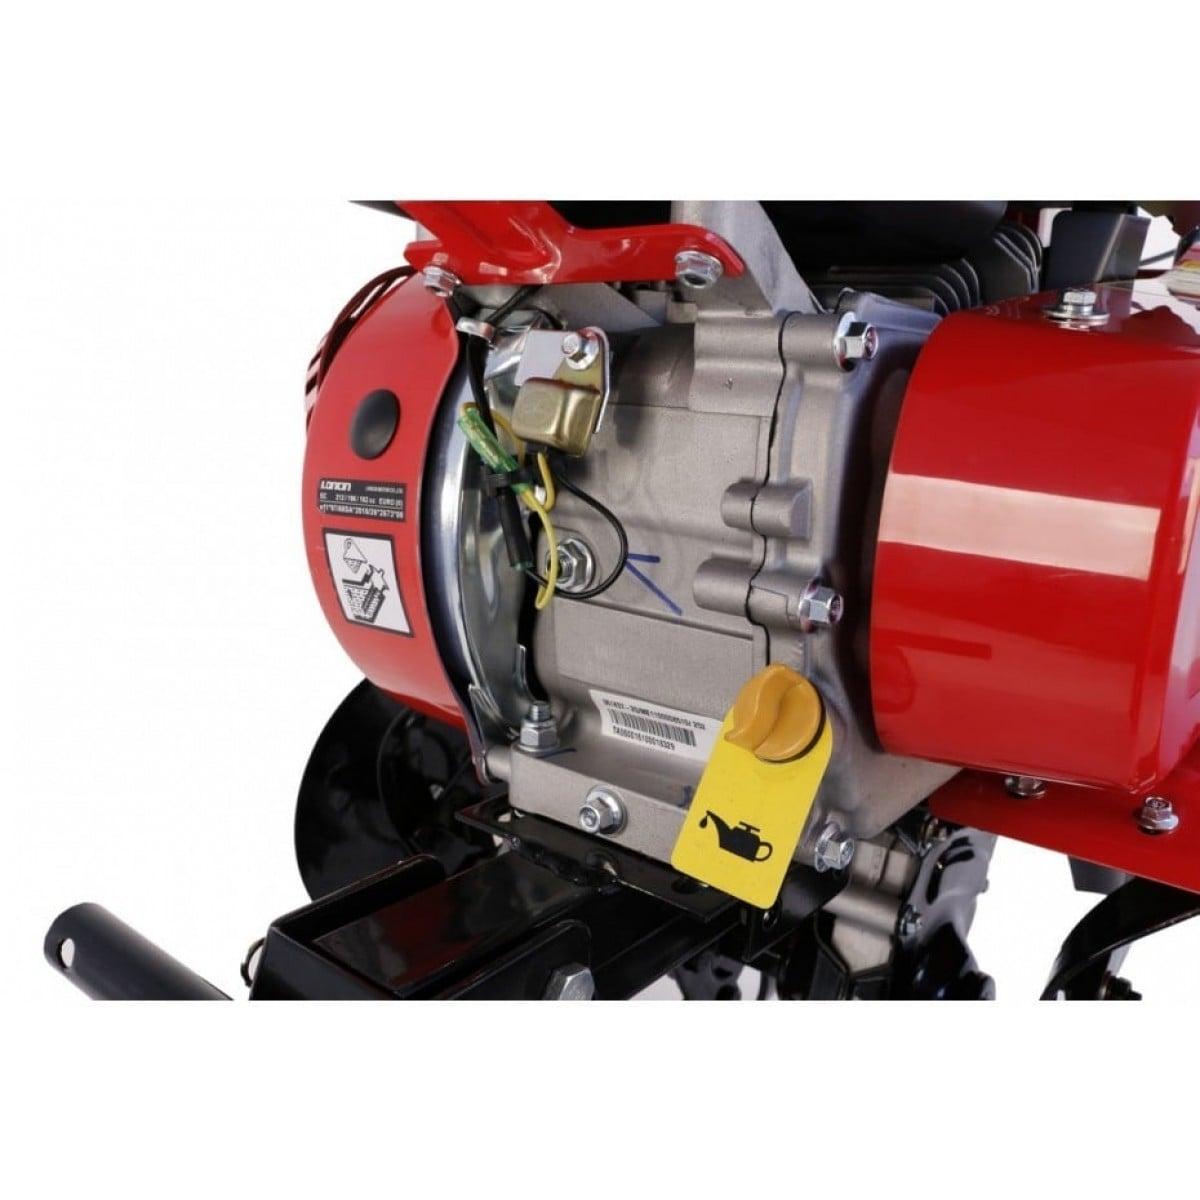 motocultor loncin lc750 7cp o mac.ro 5 2 3